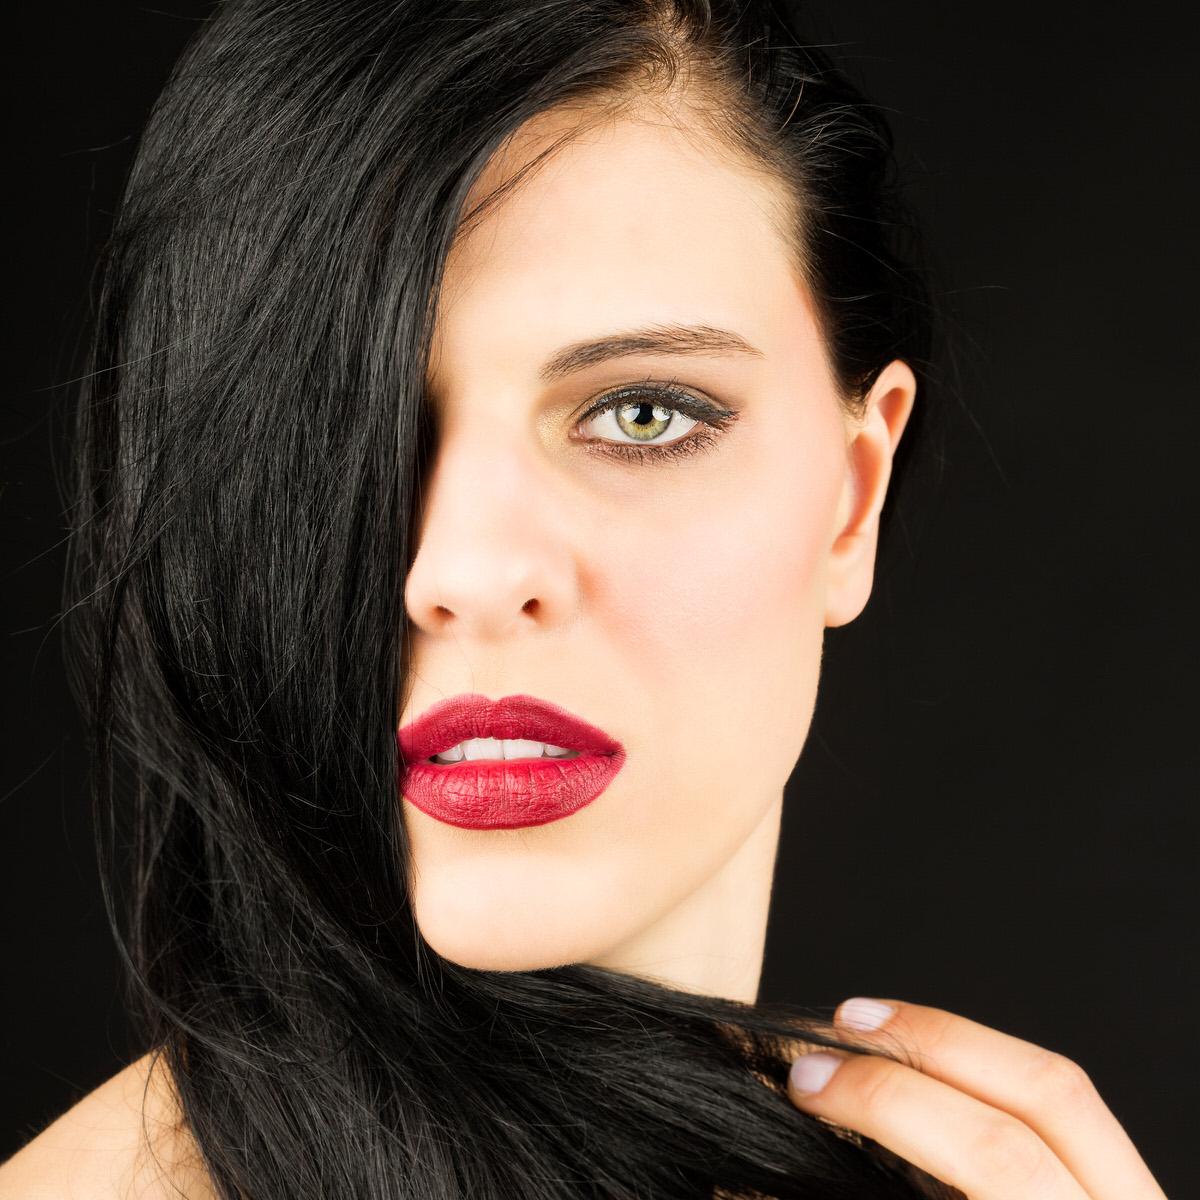 Fotodesign Bianca Wagner